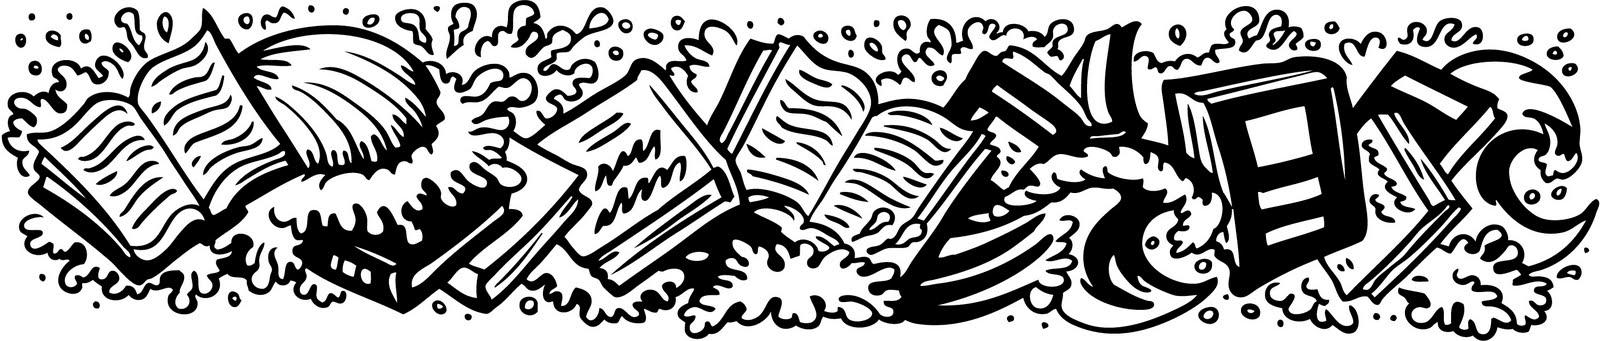 Sodus Community Library News: August 2010